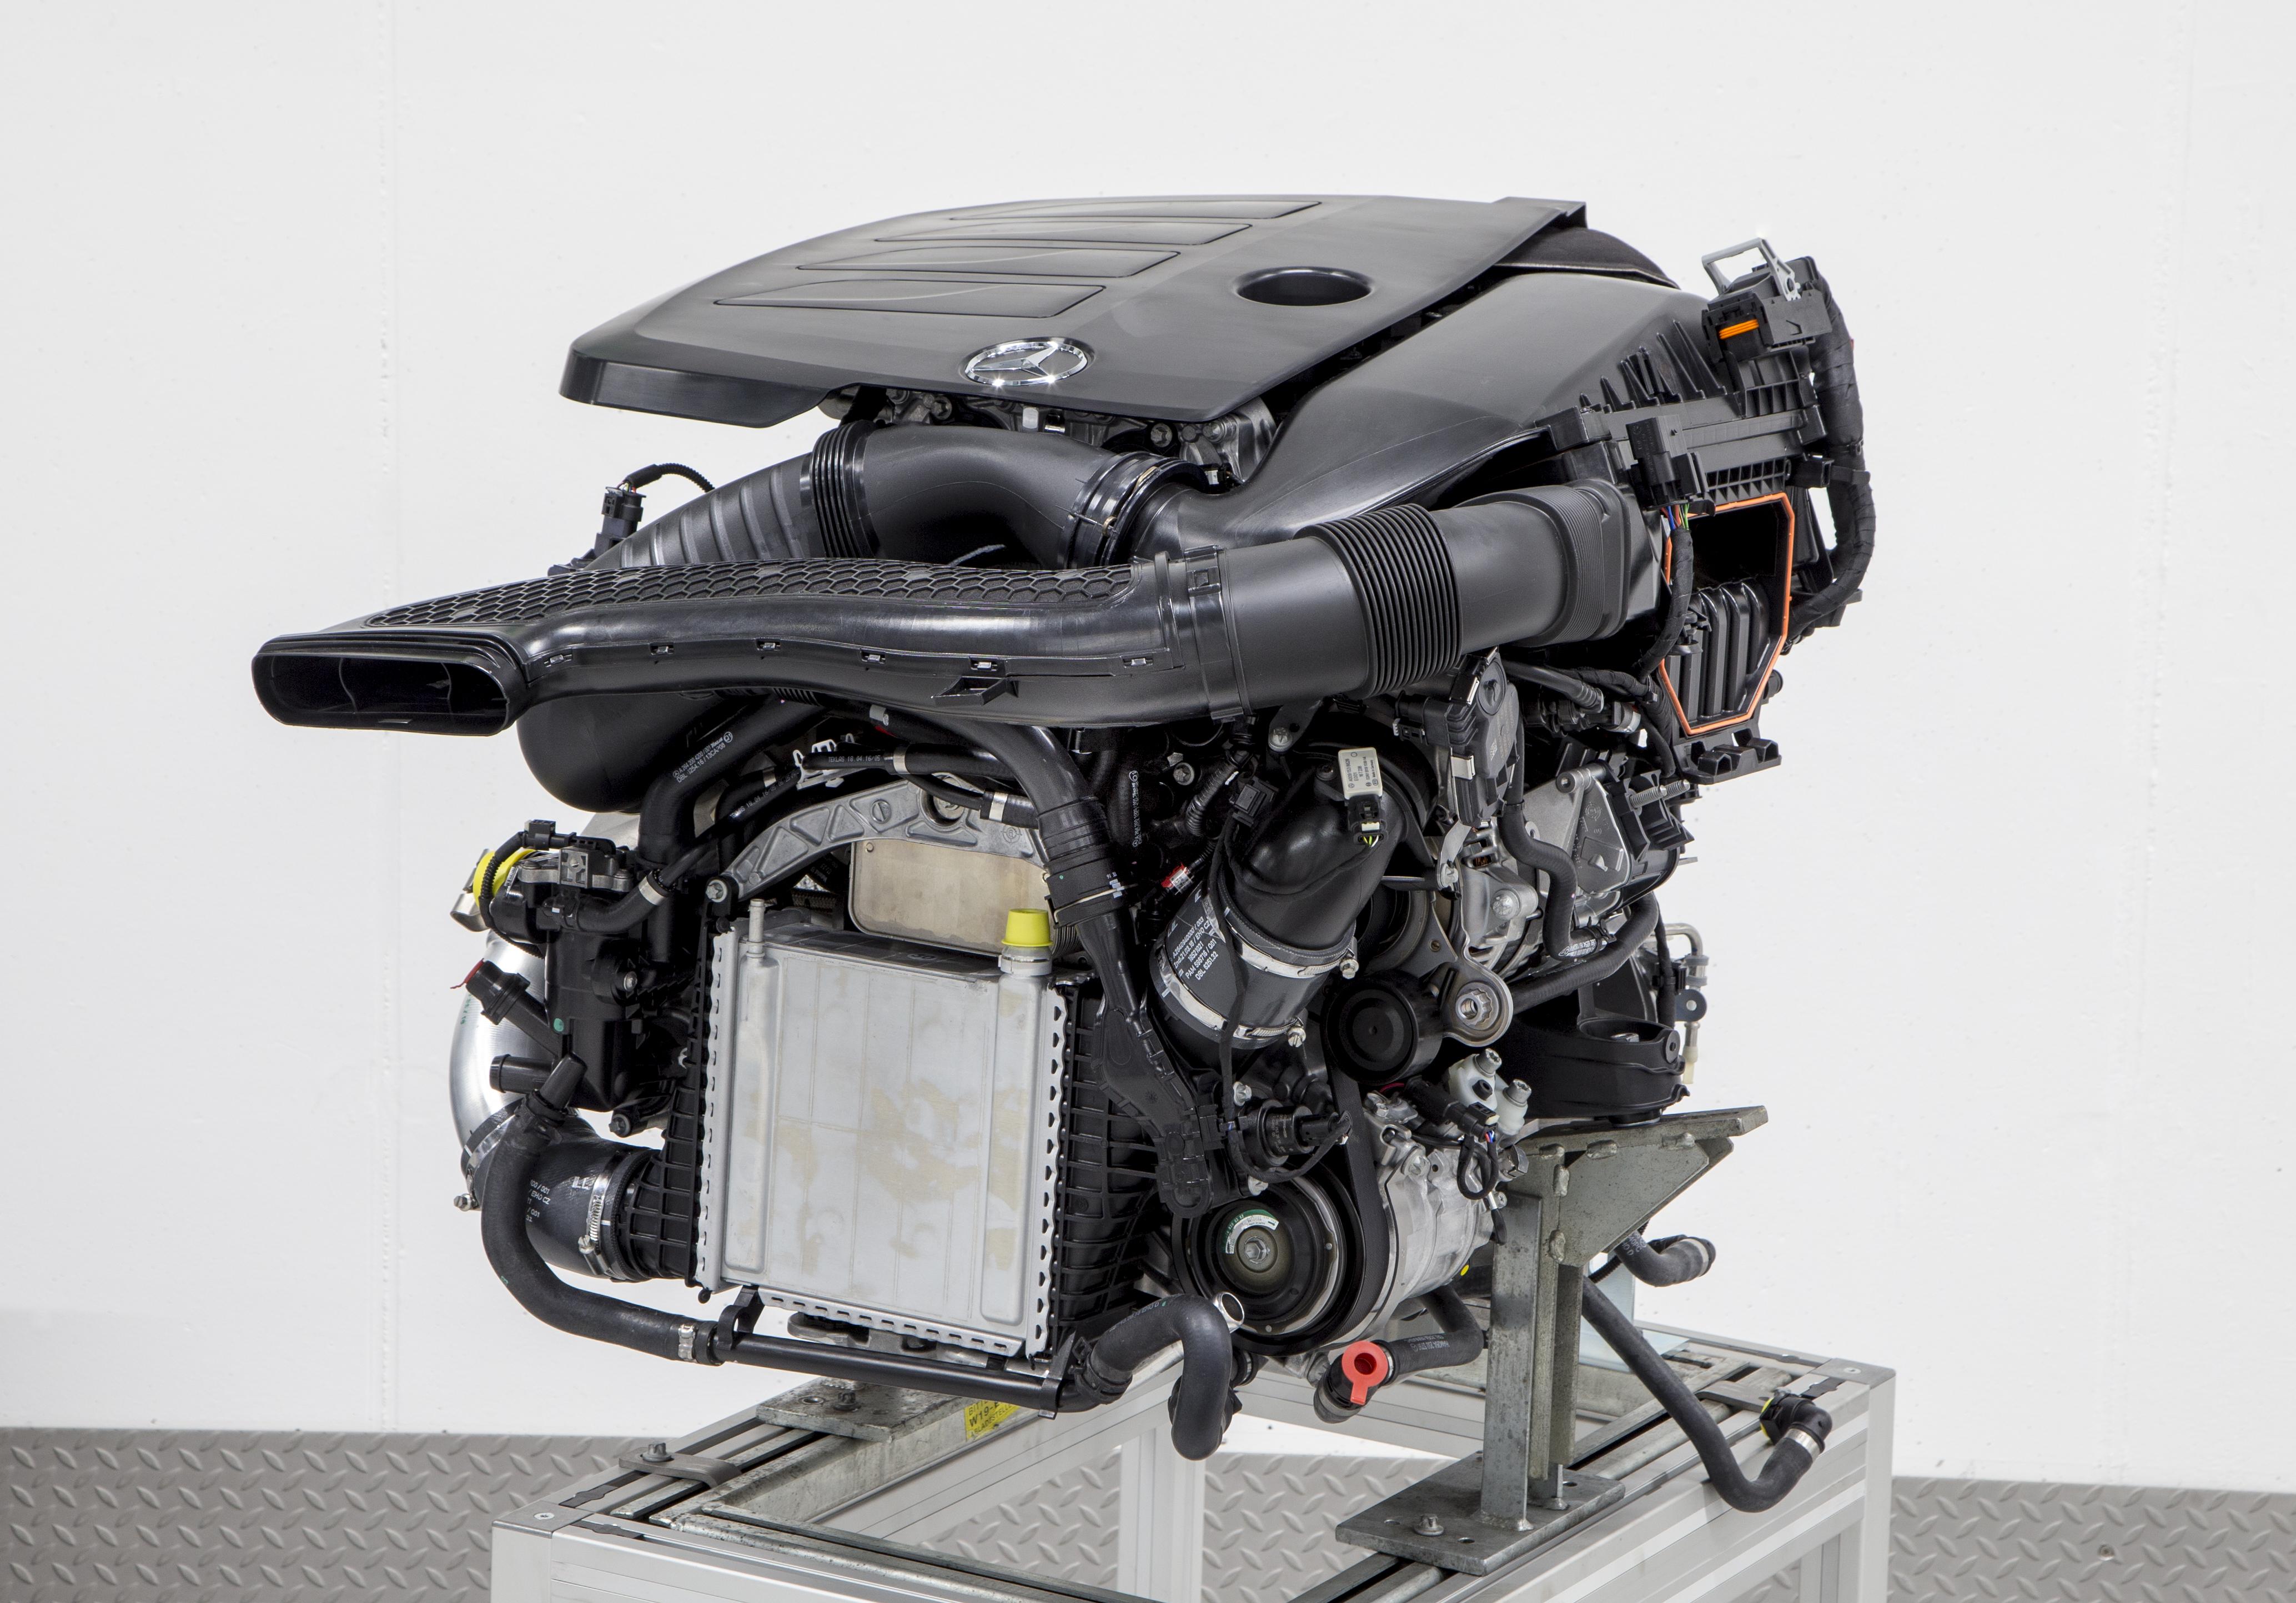 Special report mercedes benz tecday engines gtspirit for Mercedes benz engines